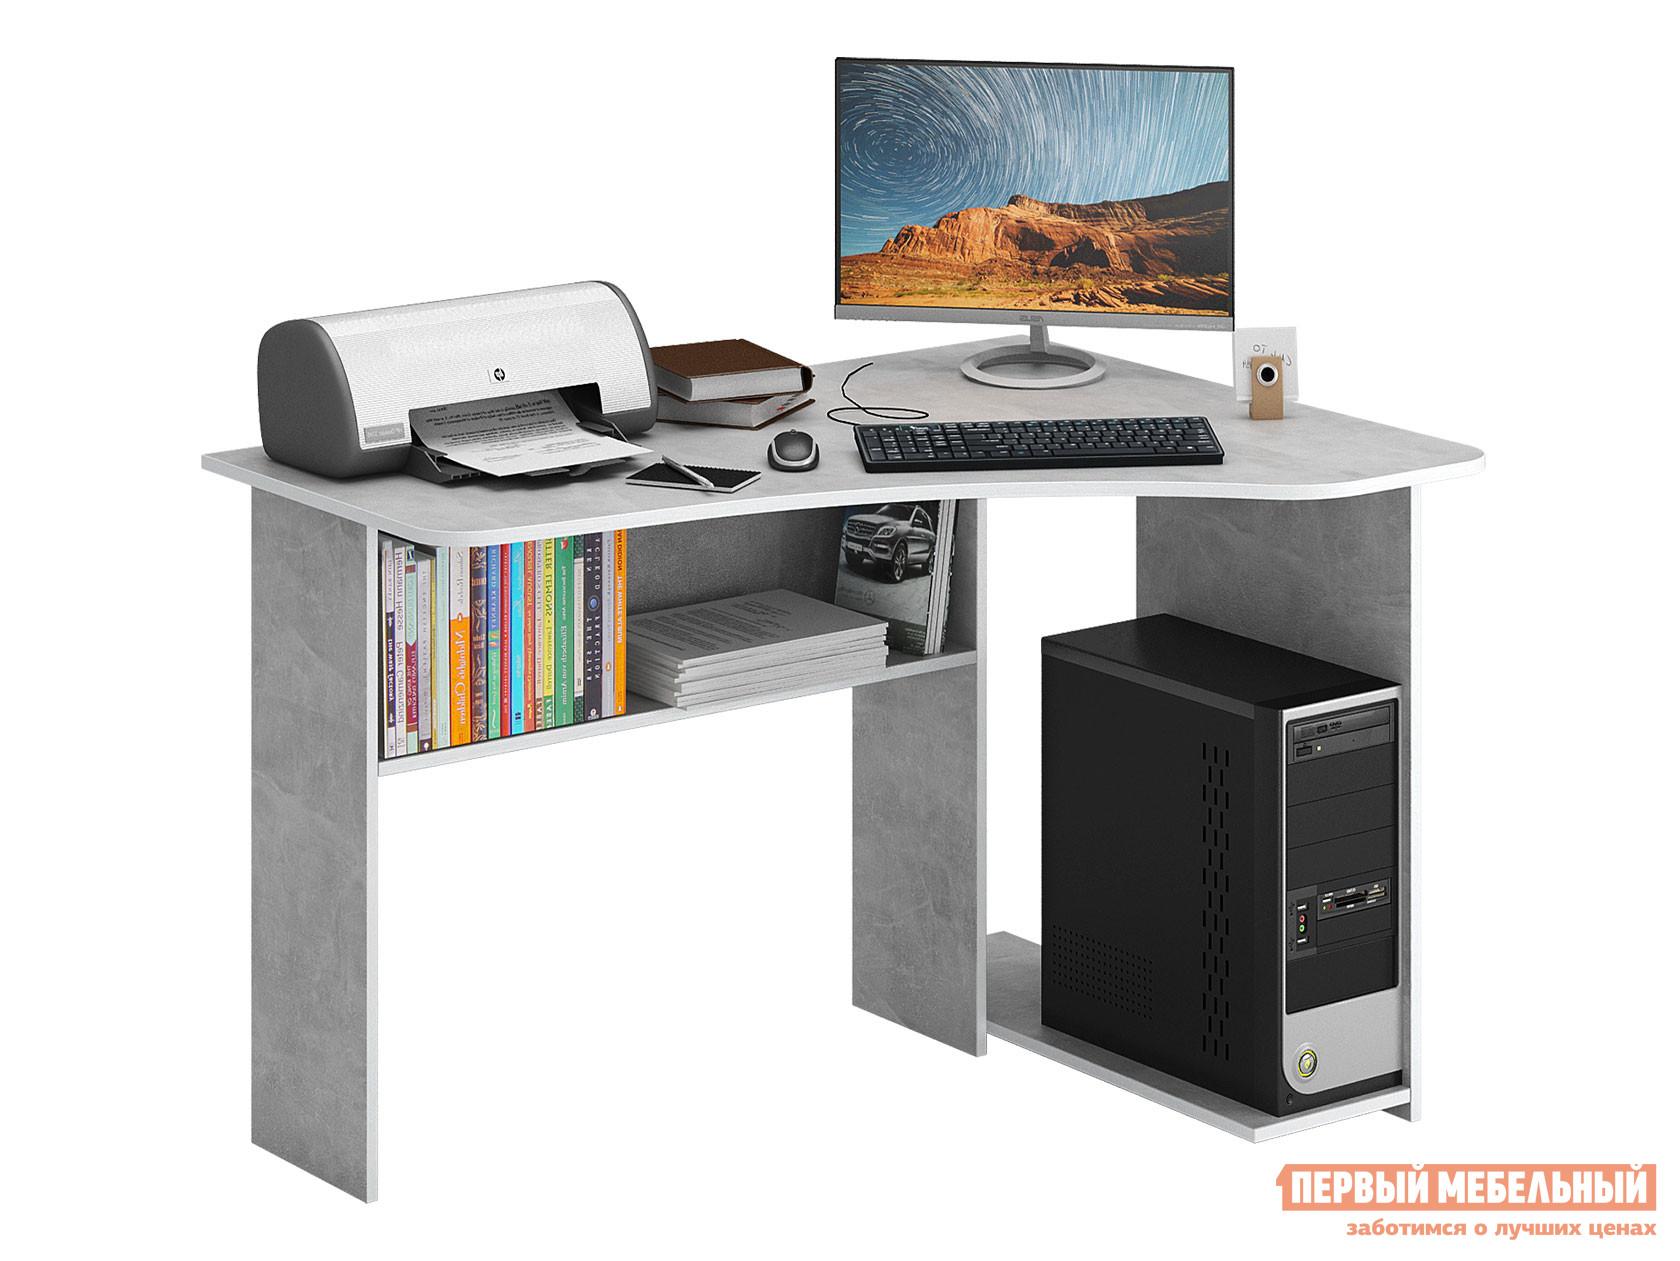 Компьютерный стол  Триан-1 Бетон, Правый МФ Мастер 128709